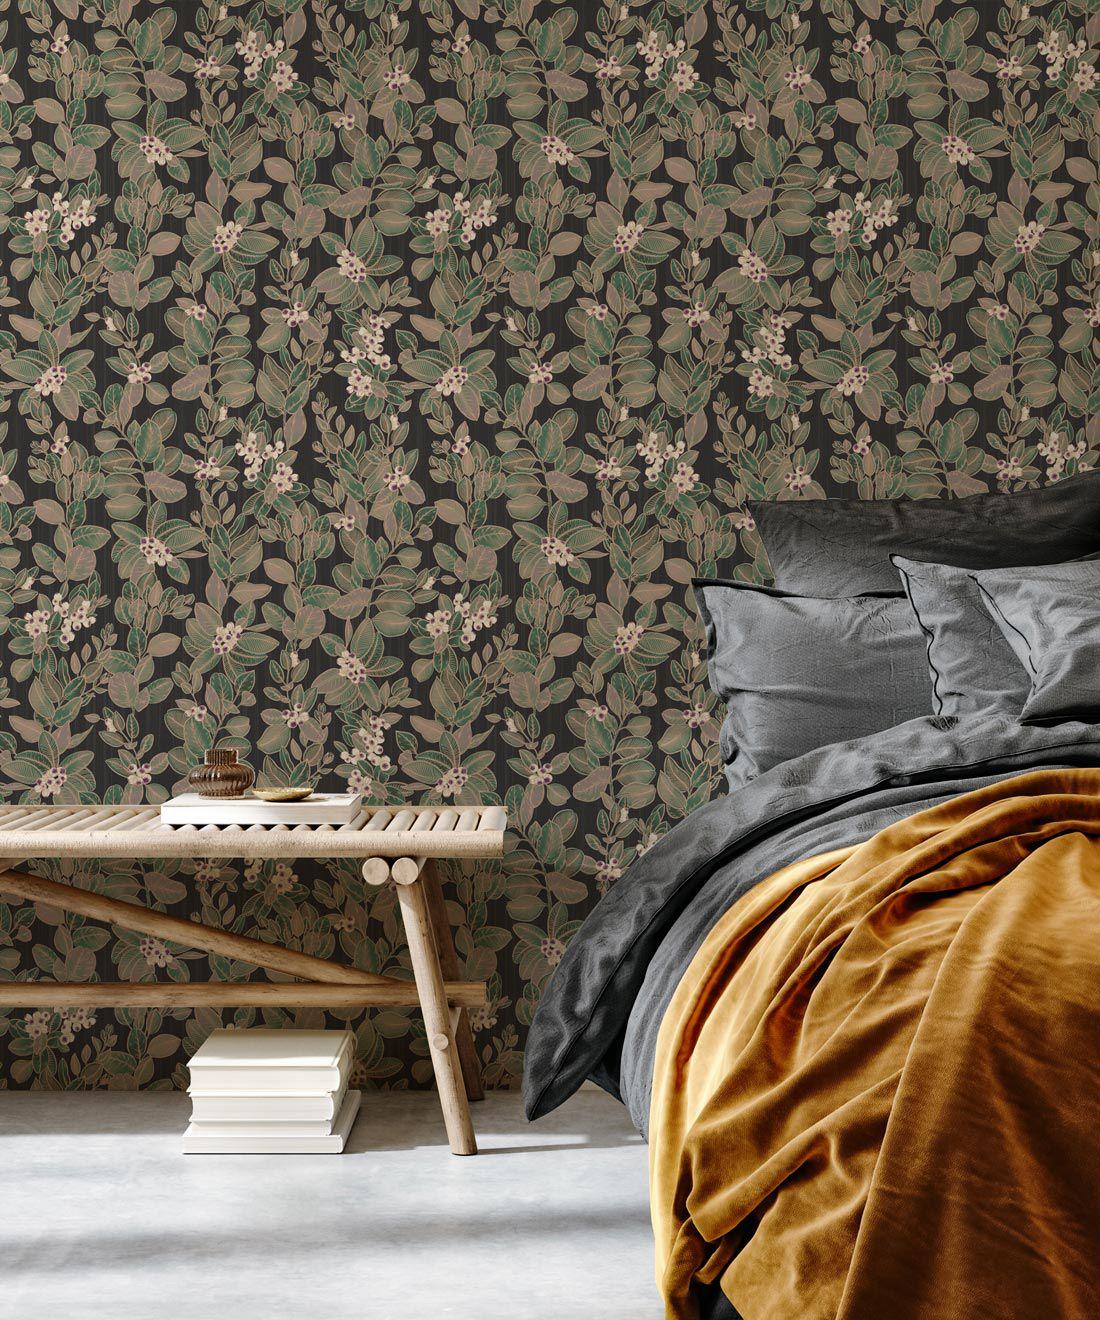 Eucalyptus Wallpaper • Eloise Short • Vintage Floral Wallpaper •Granny Chic Wallpaper • Grandmillennial Style Wallpaper •Pebble •Insitu